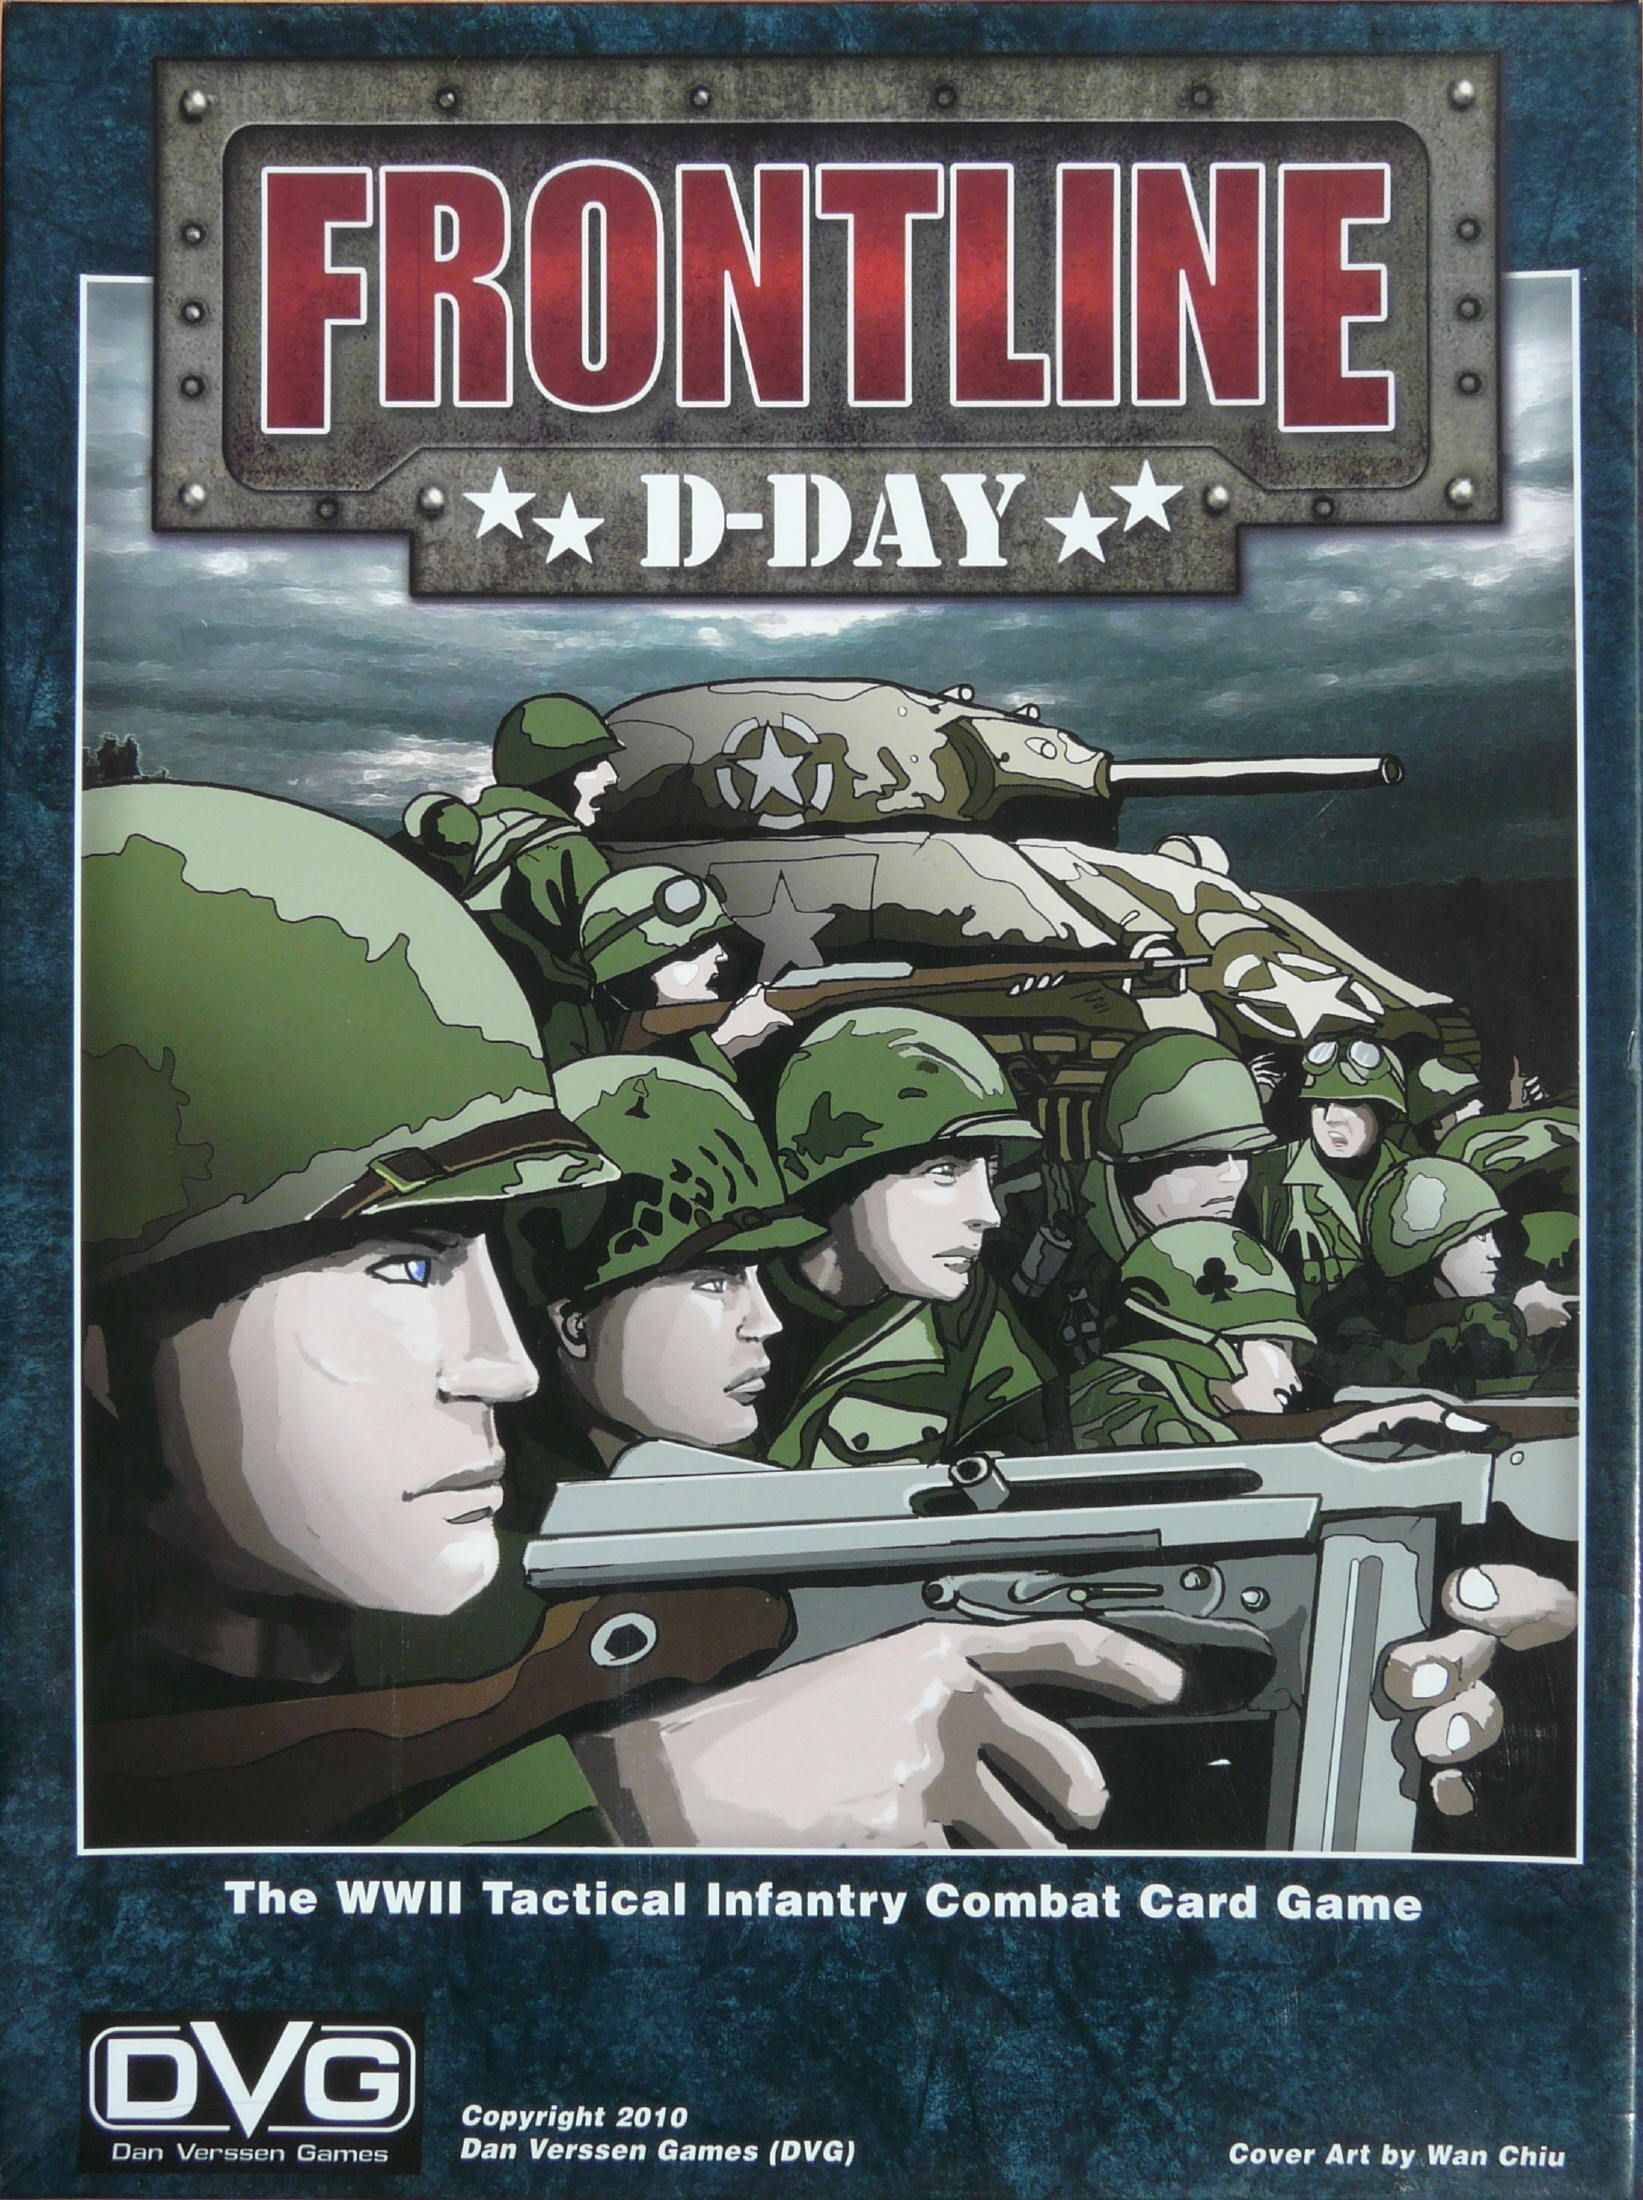 Frontline: D-Day